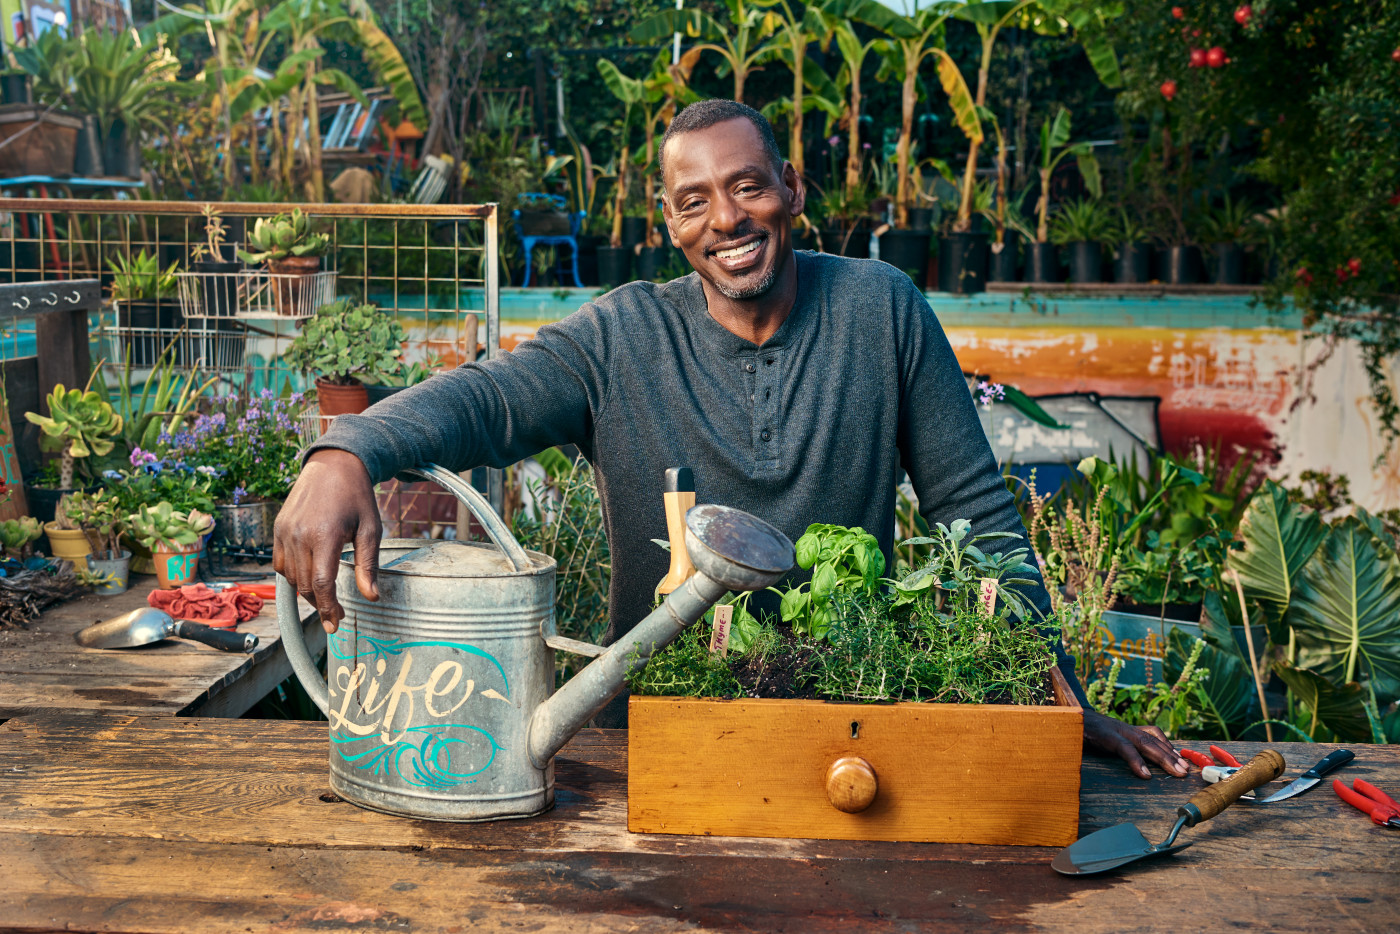 ron-finley-gardening-with-attitude-masterclass-complex-interview